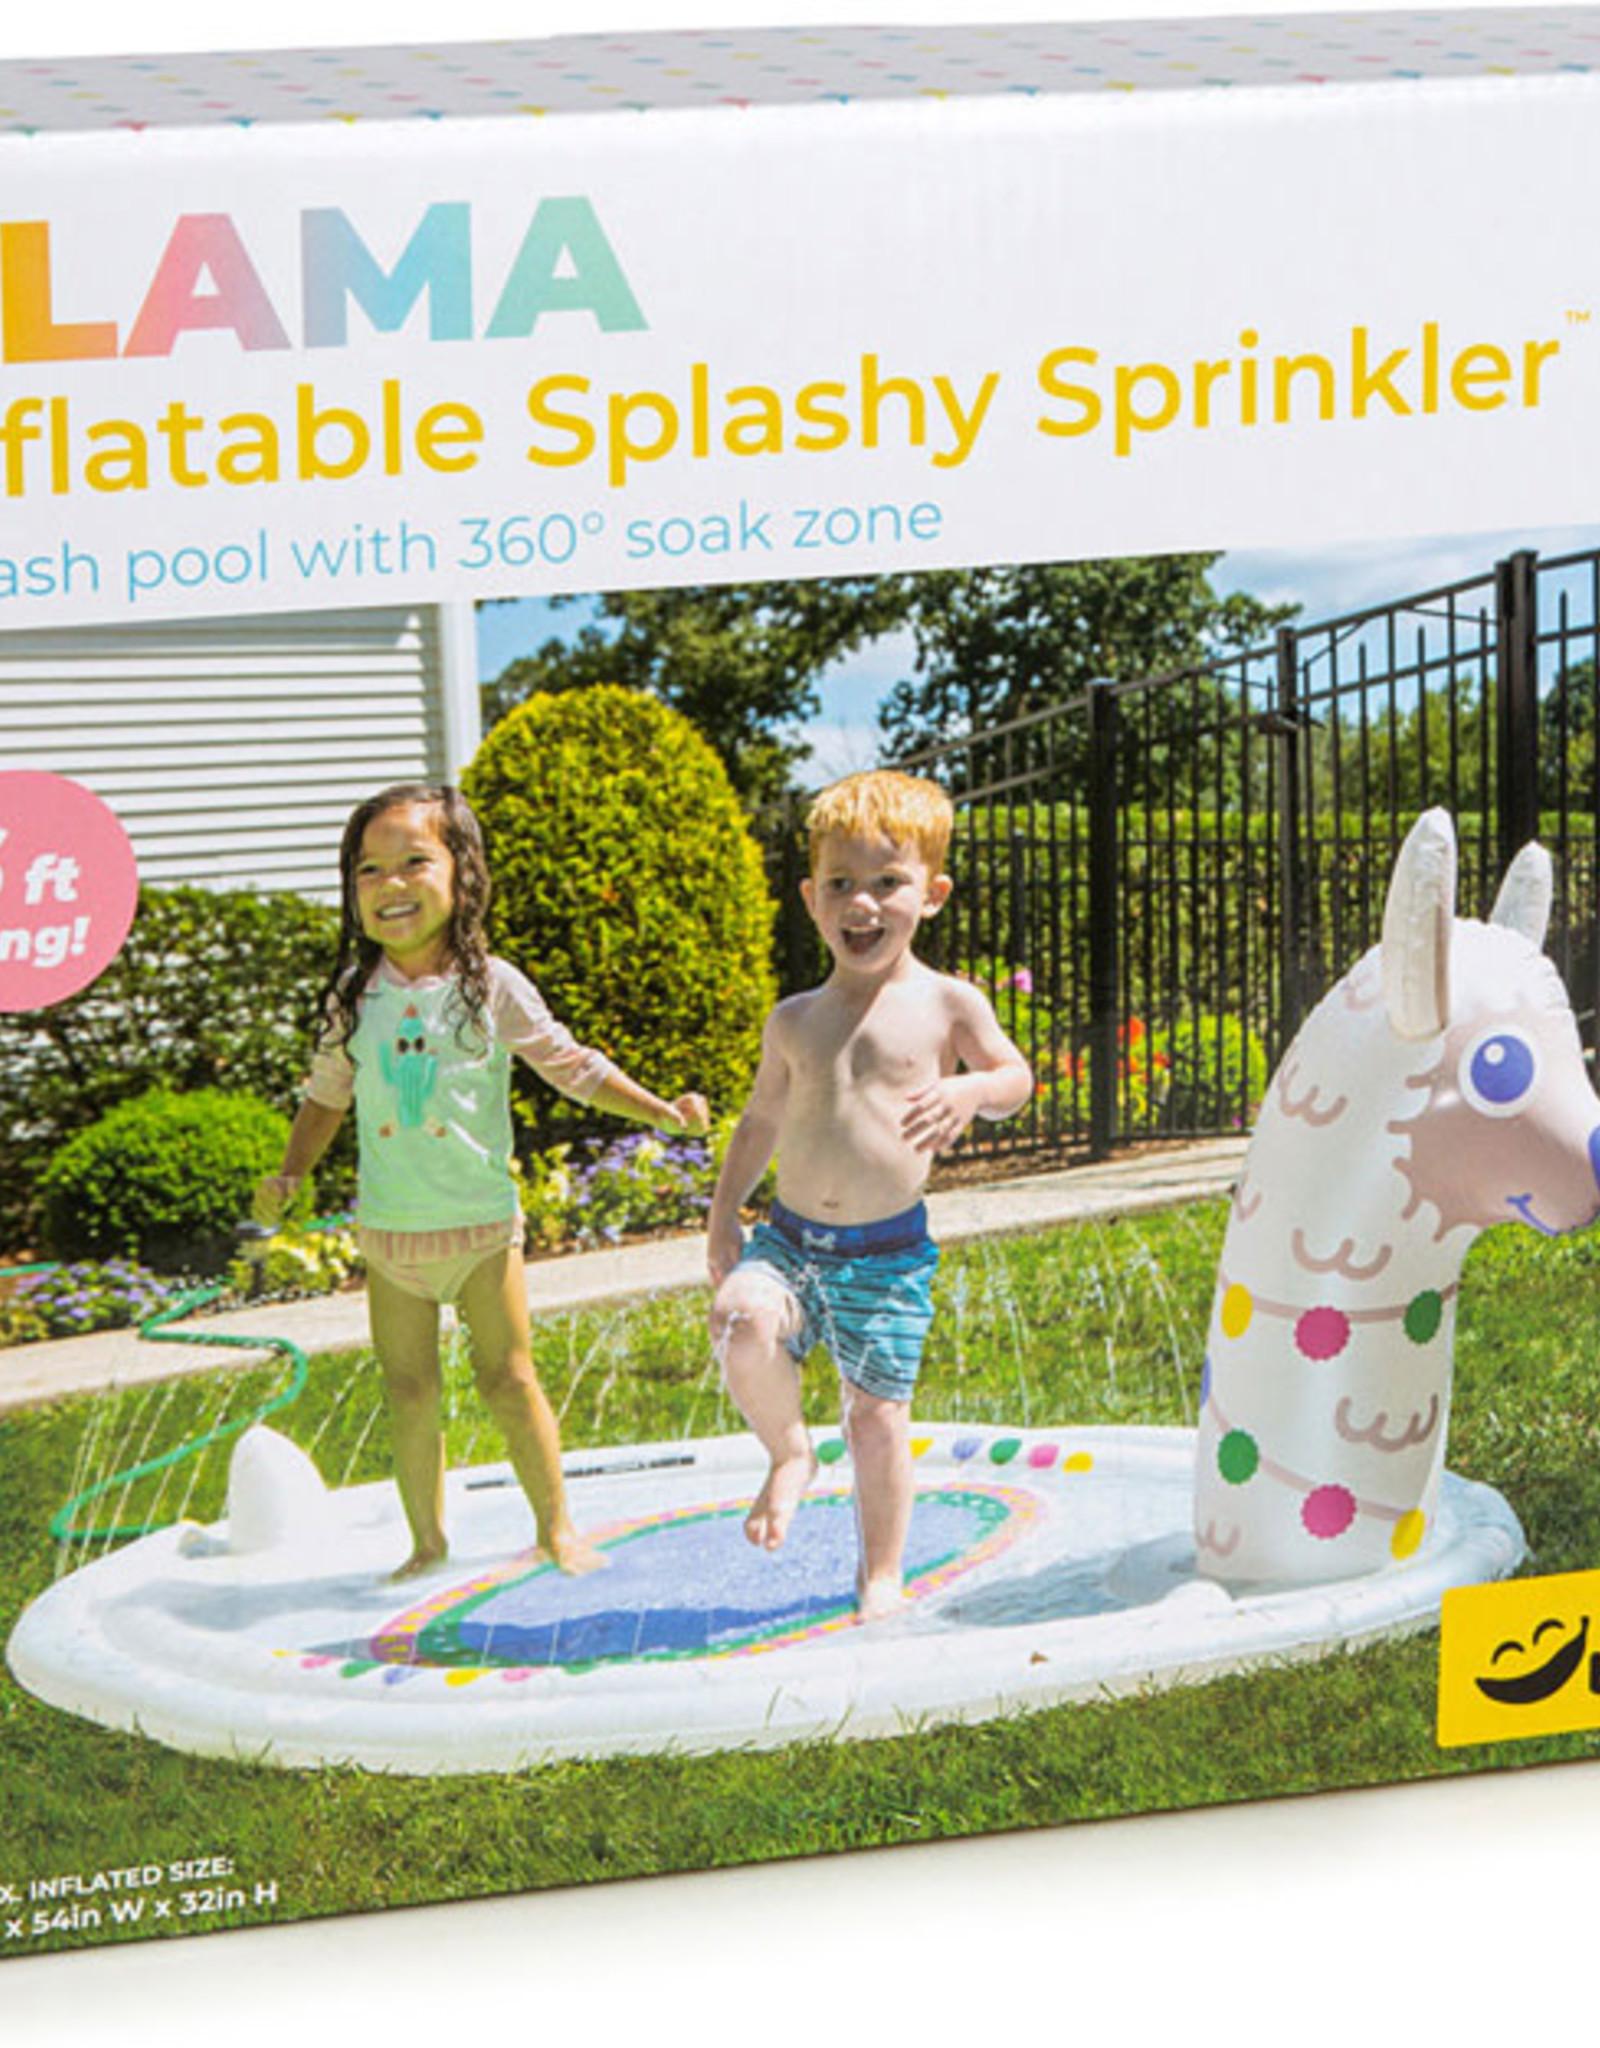 Splashy Sprinklers Llama